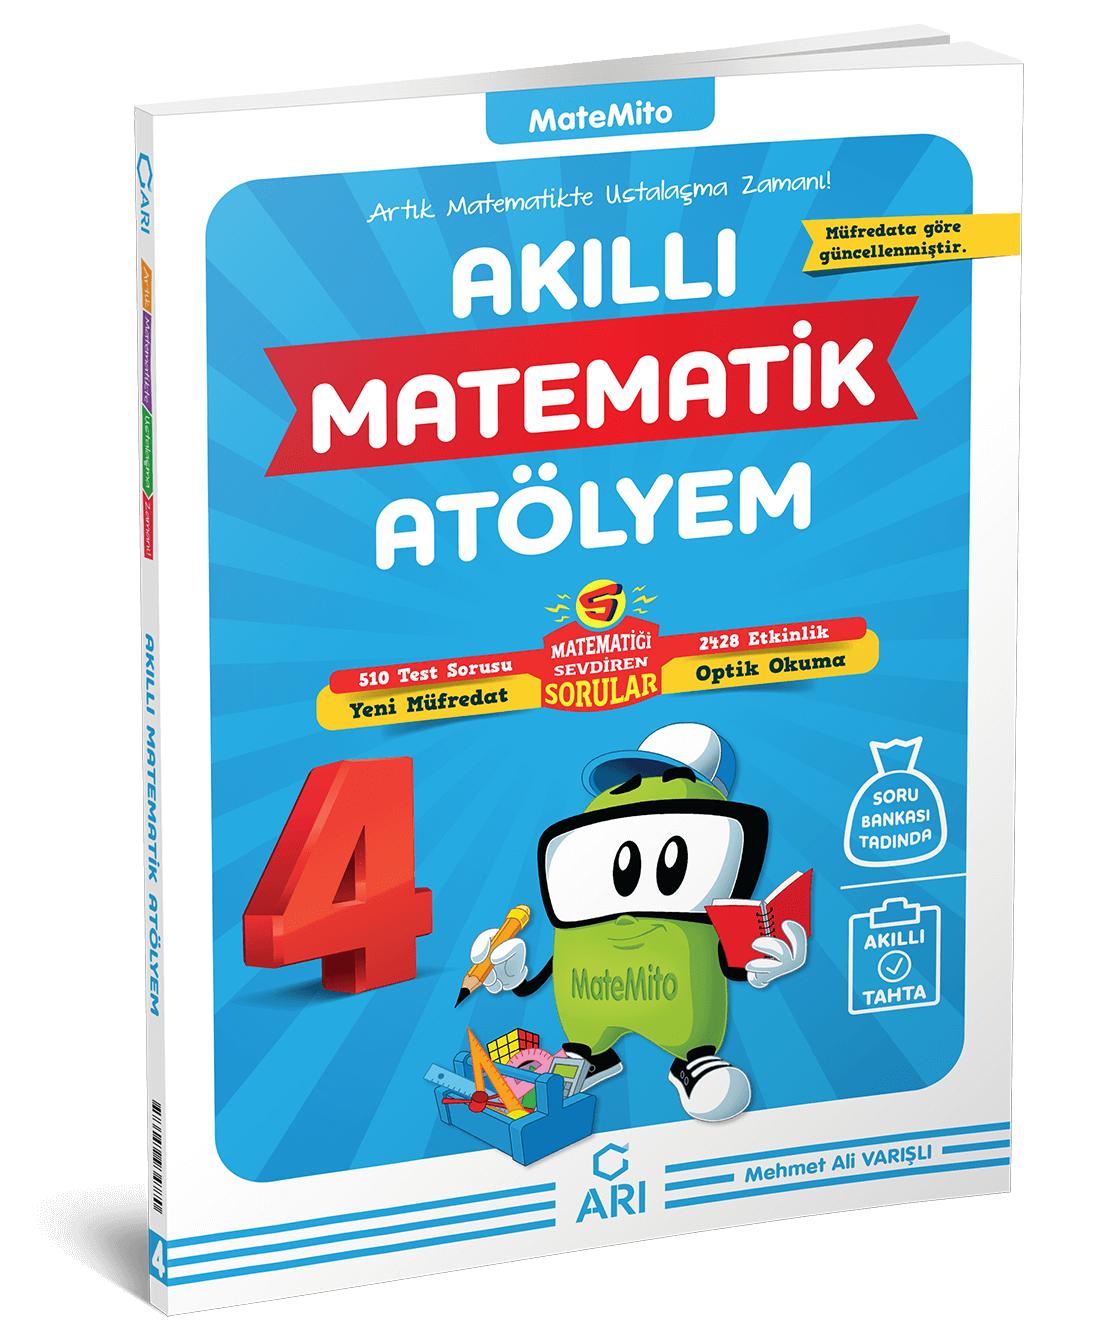 Matemito Akilli Matematik Atolyem 4 Sinif Ari Yayin Ari